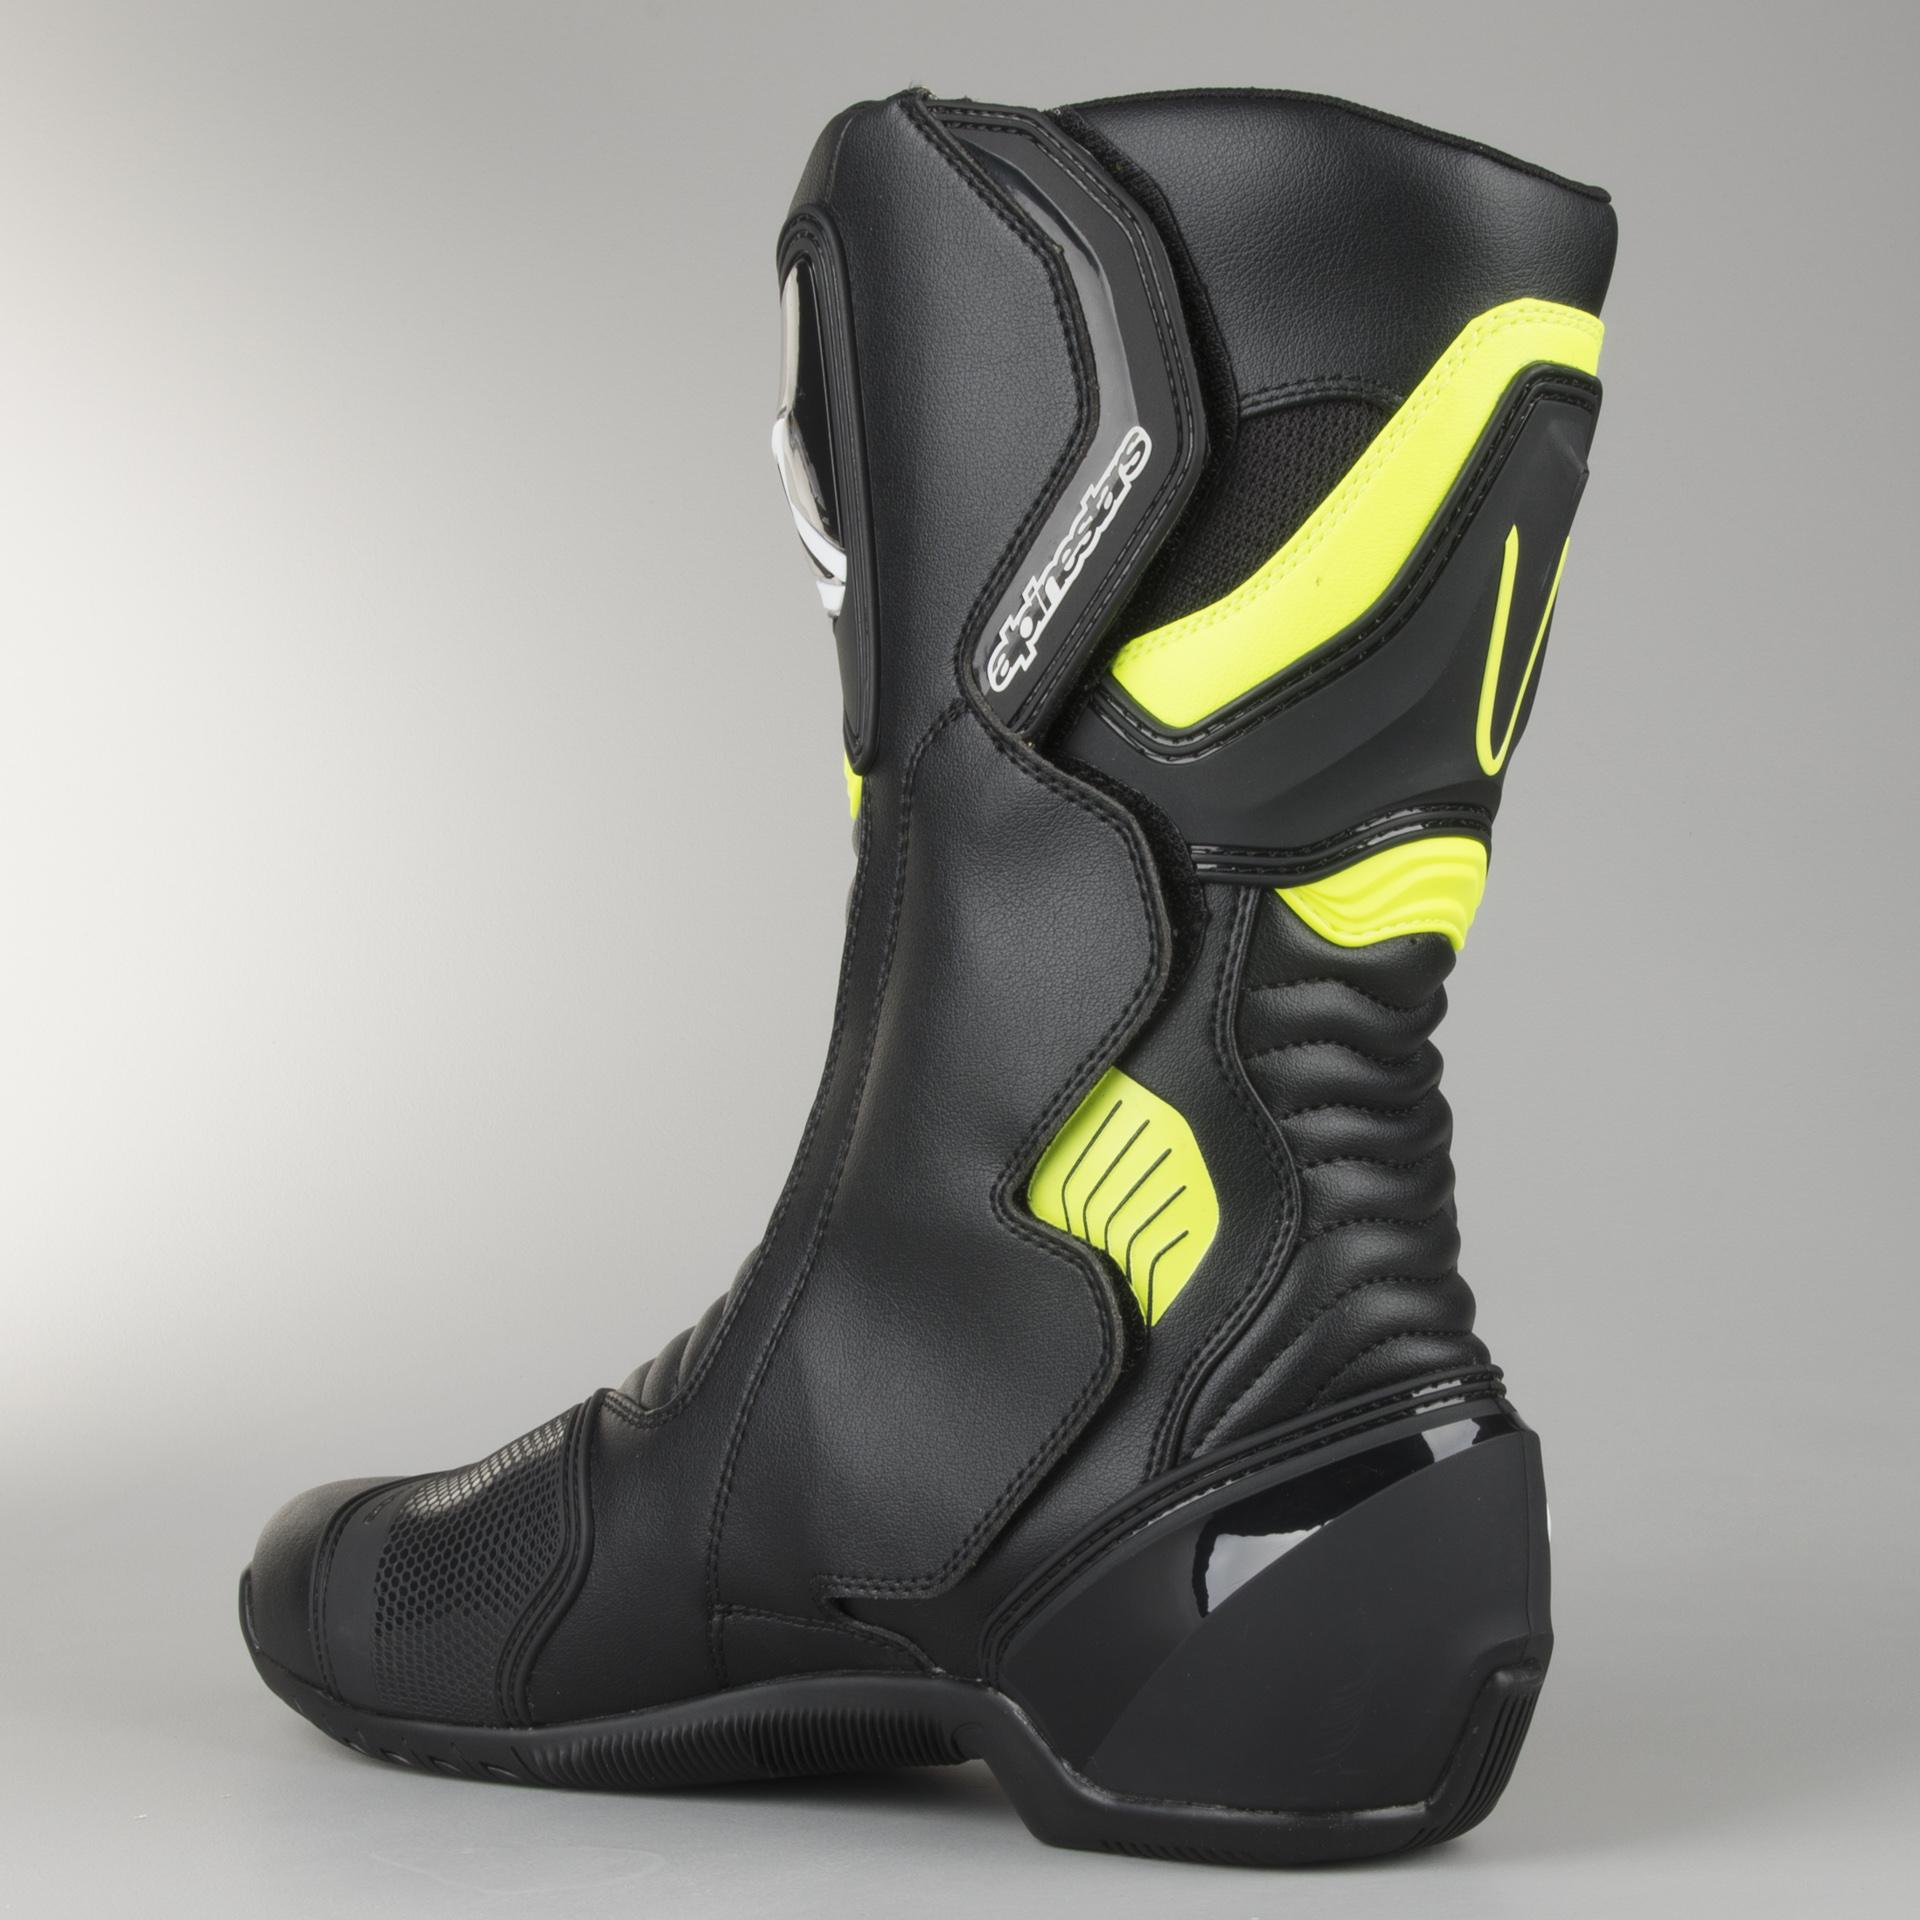 Alpinestars SMX 6 V2 Boots Black Yellow Fluo | SETTANTADUE.IT